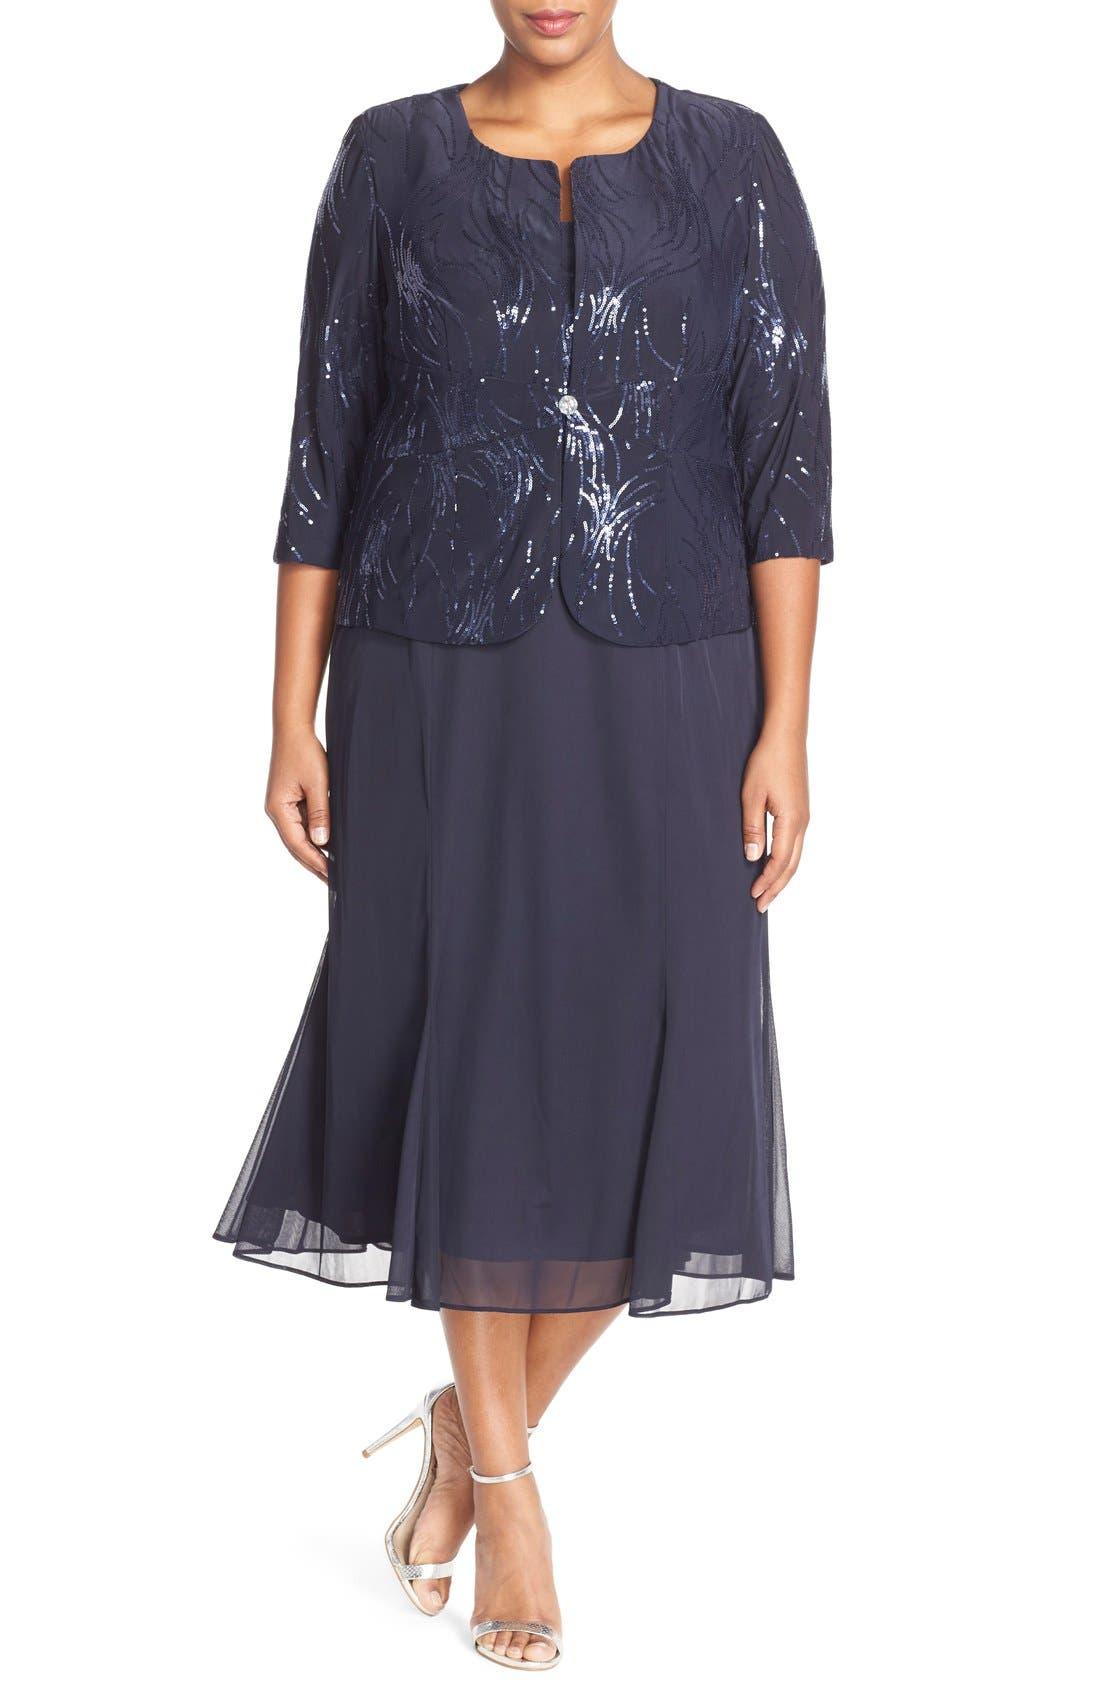 Plus Size Vintage Dresses, Clothing, Costumes Plus Size Womens Alex Evenings Sequin Mock Two-Piece Dress With Jacket Size 24W - Blue $146.30 AT vintagedancer.com